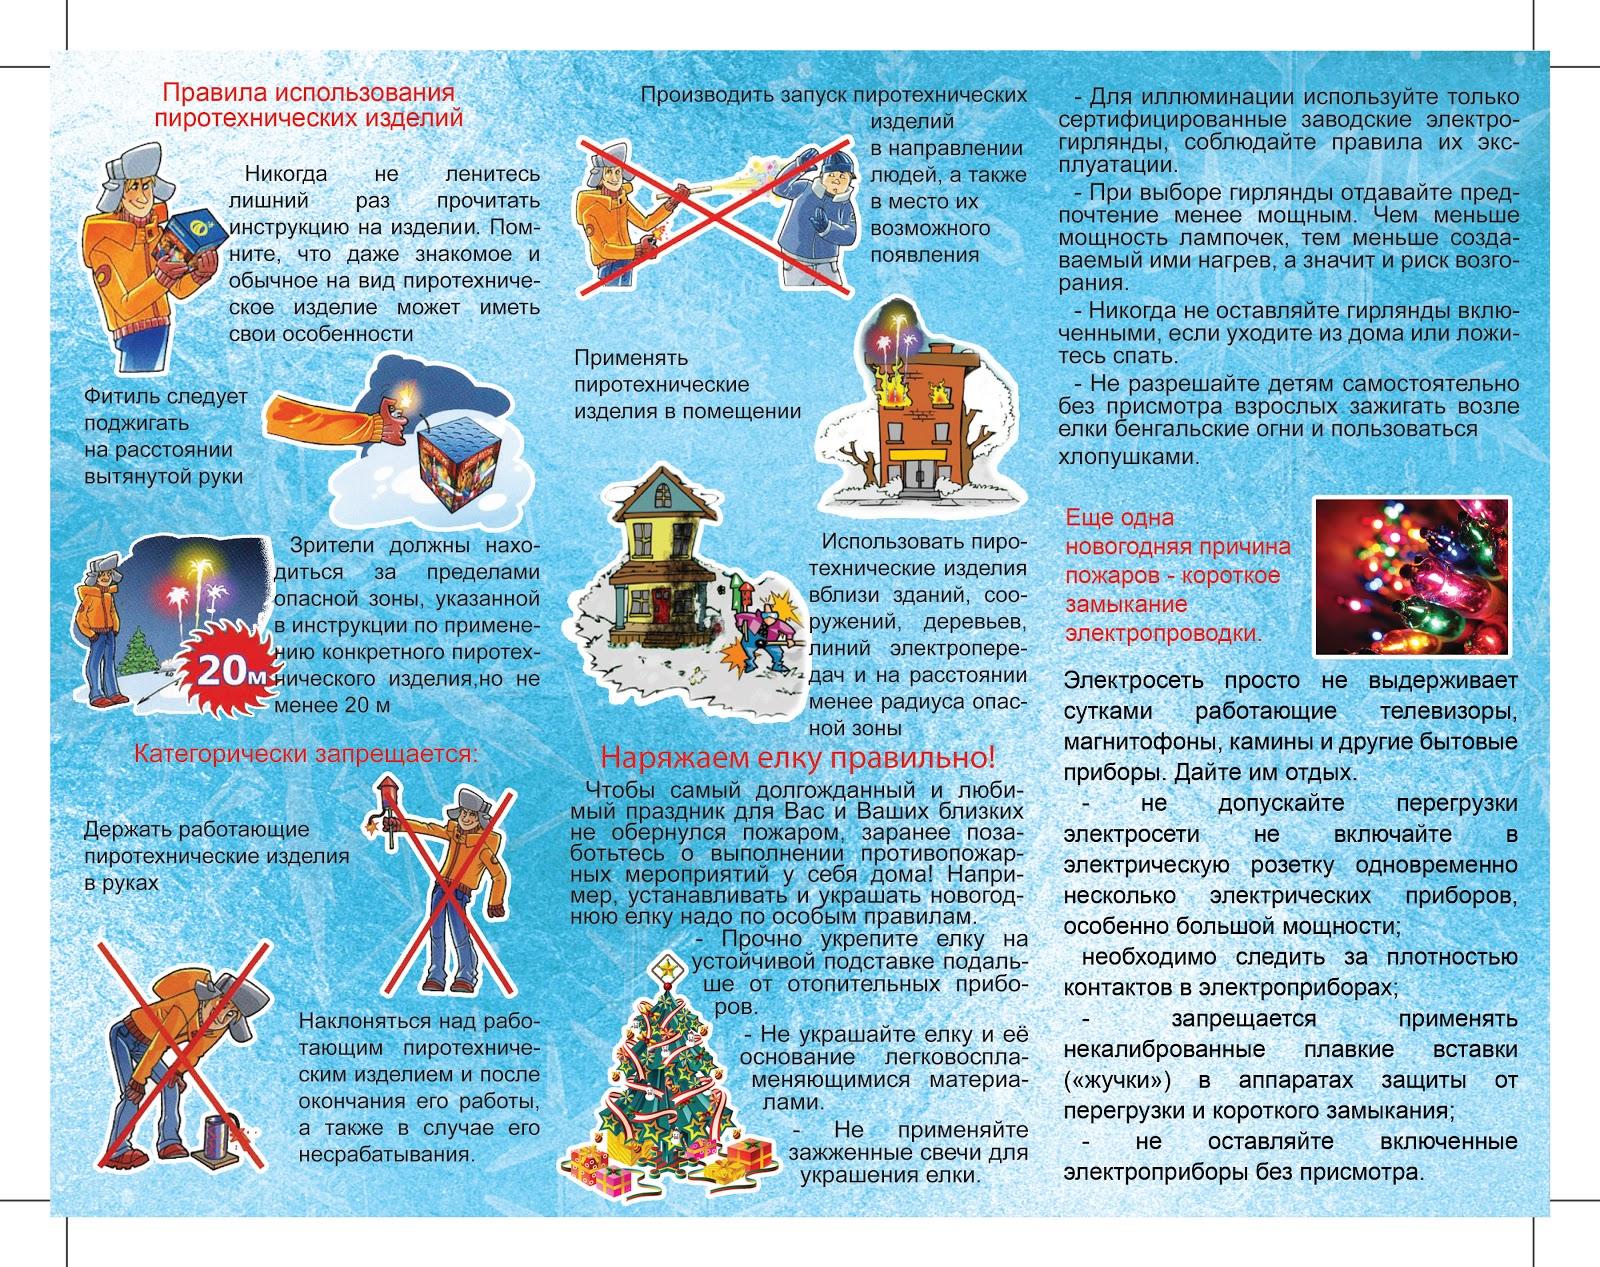 Картинки по запросу техника безопасности на новый год